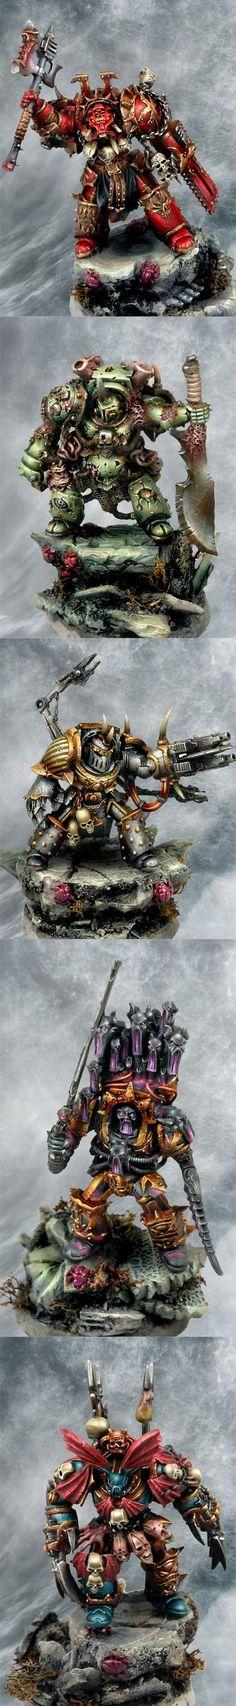 Warhammer-40000-Wh-Песочница-фэндомы-Miniatures-(Wh-40000)-1739020.jpeg (500×3617)